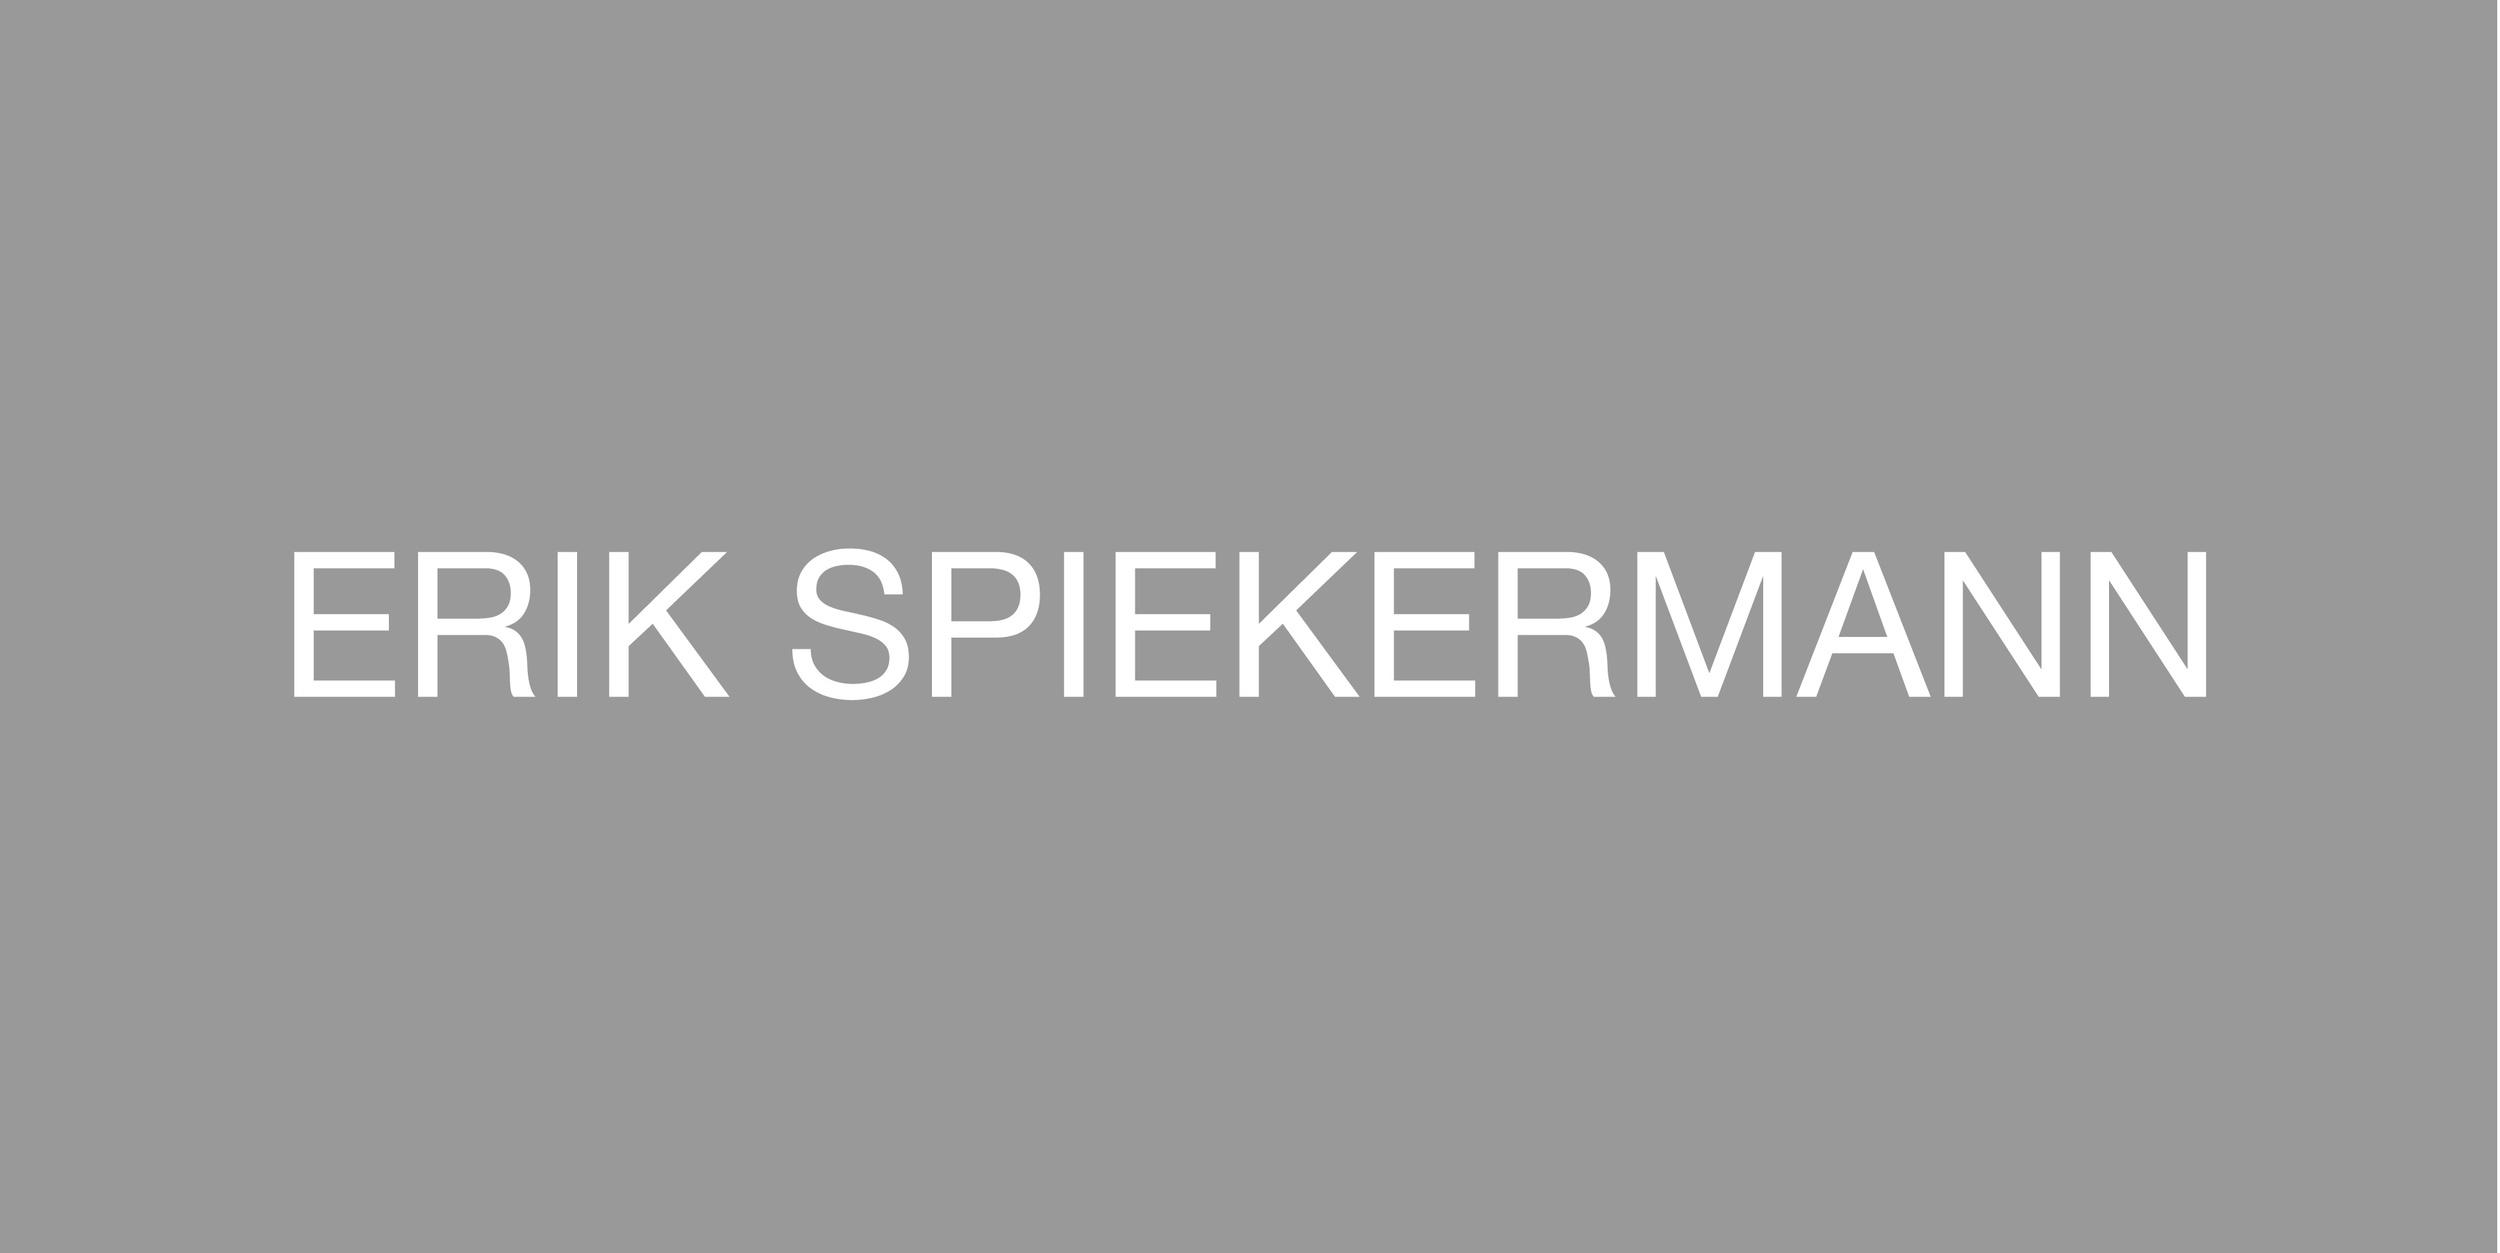 FTM_Erik Spiekermann.jpg